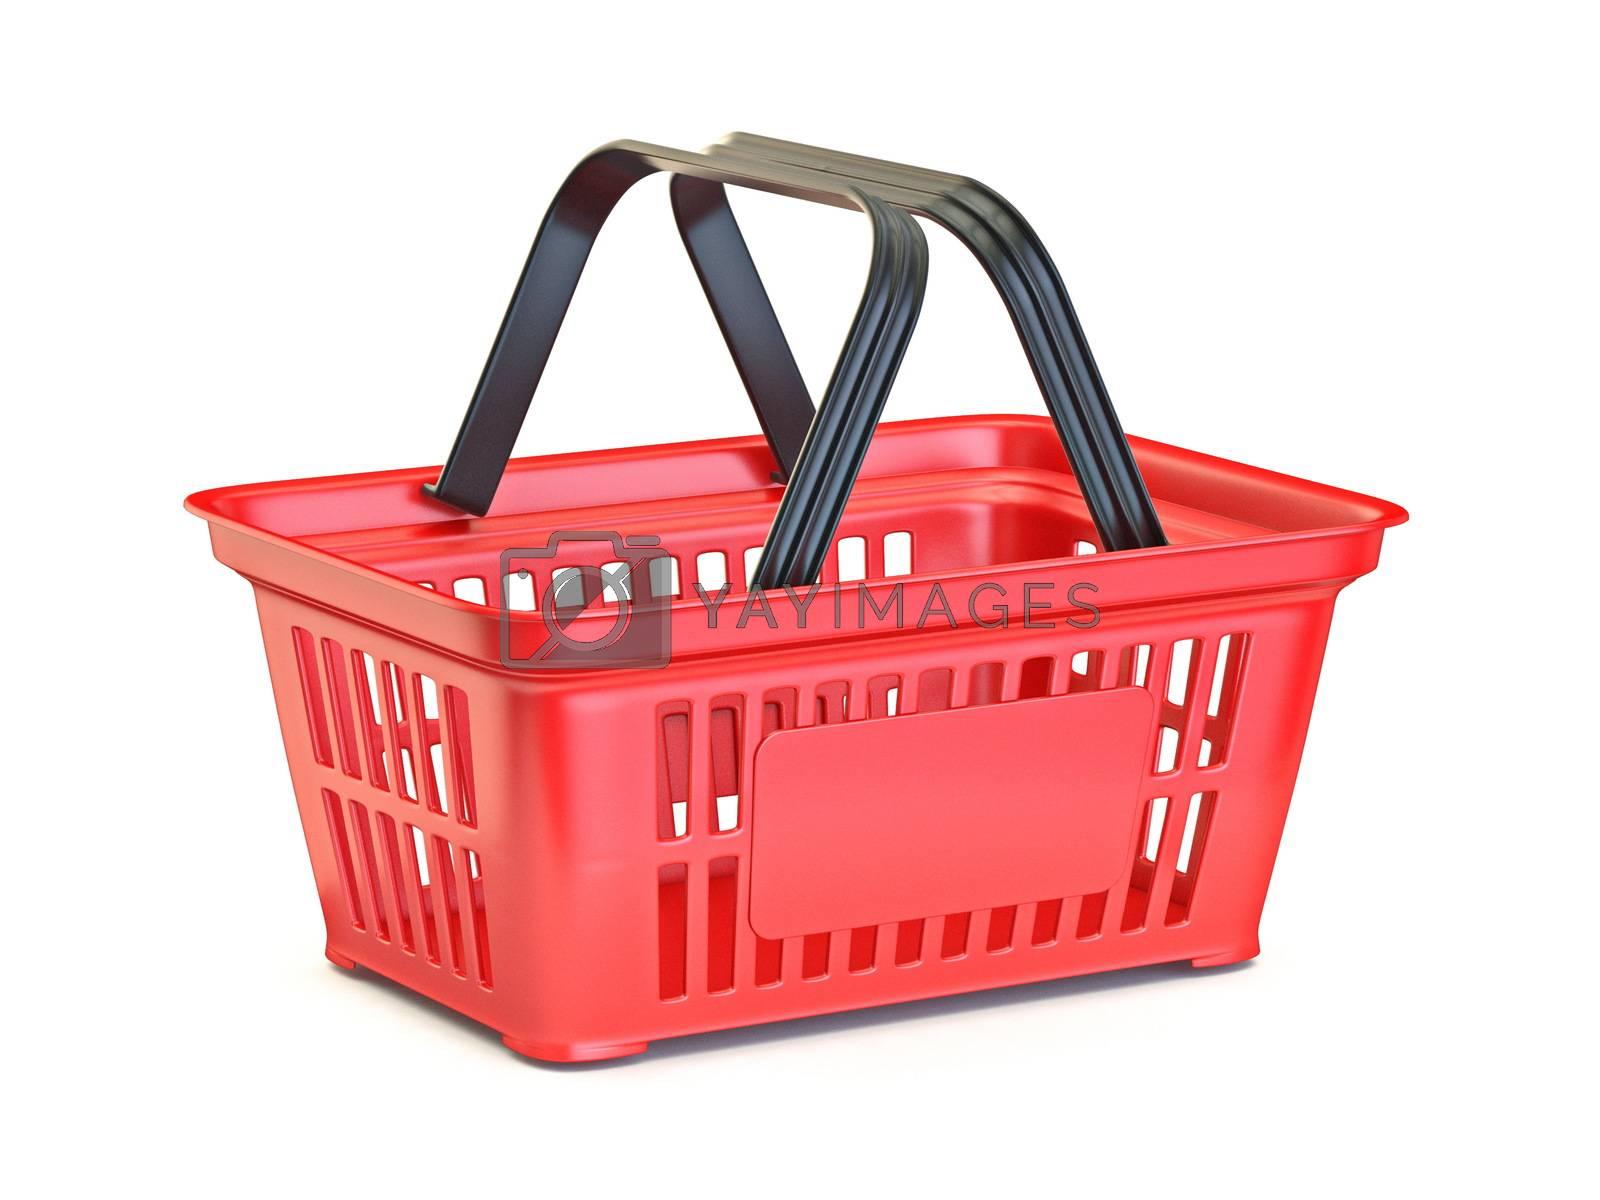 Red shopping basket 3D render illustration isolated on white background